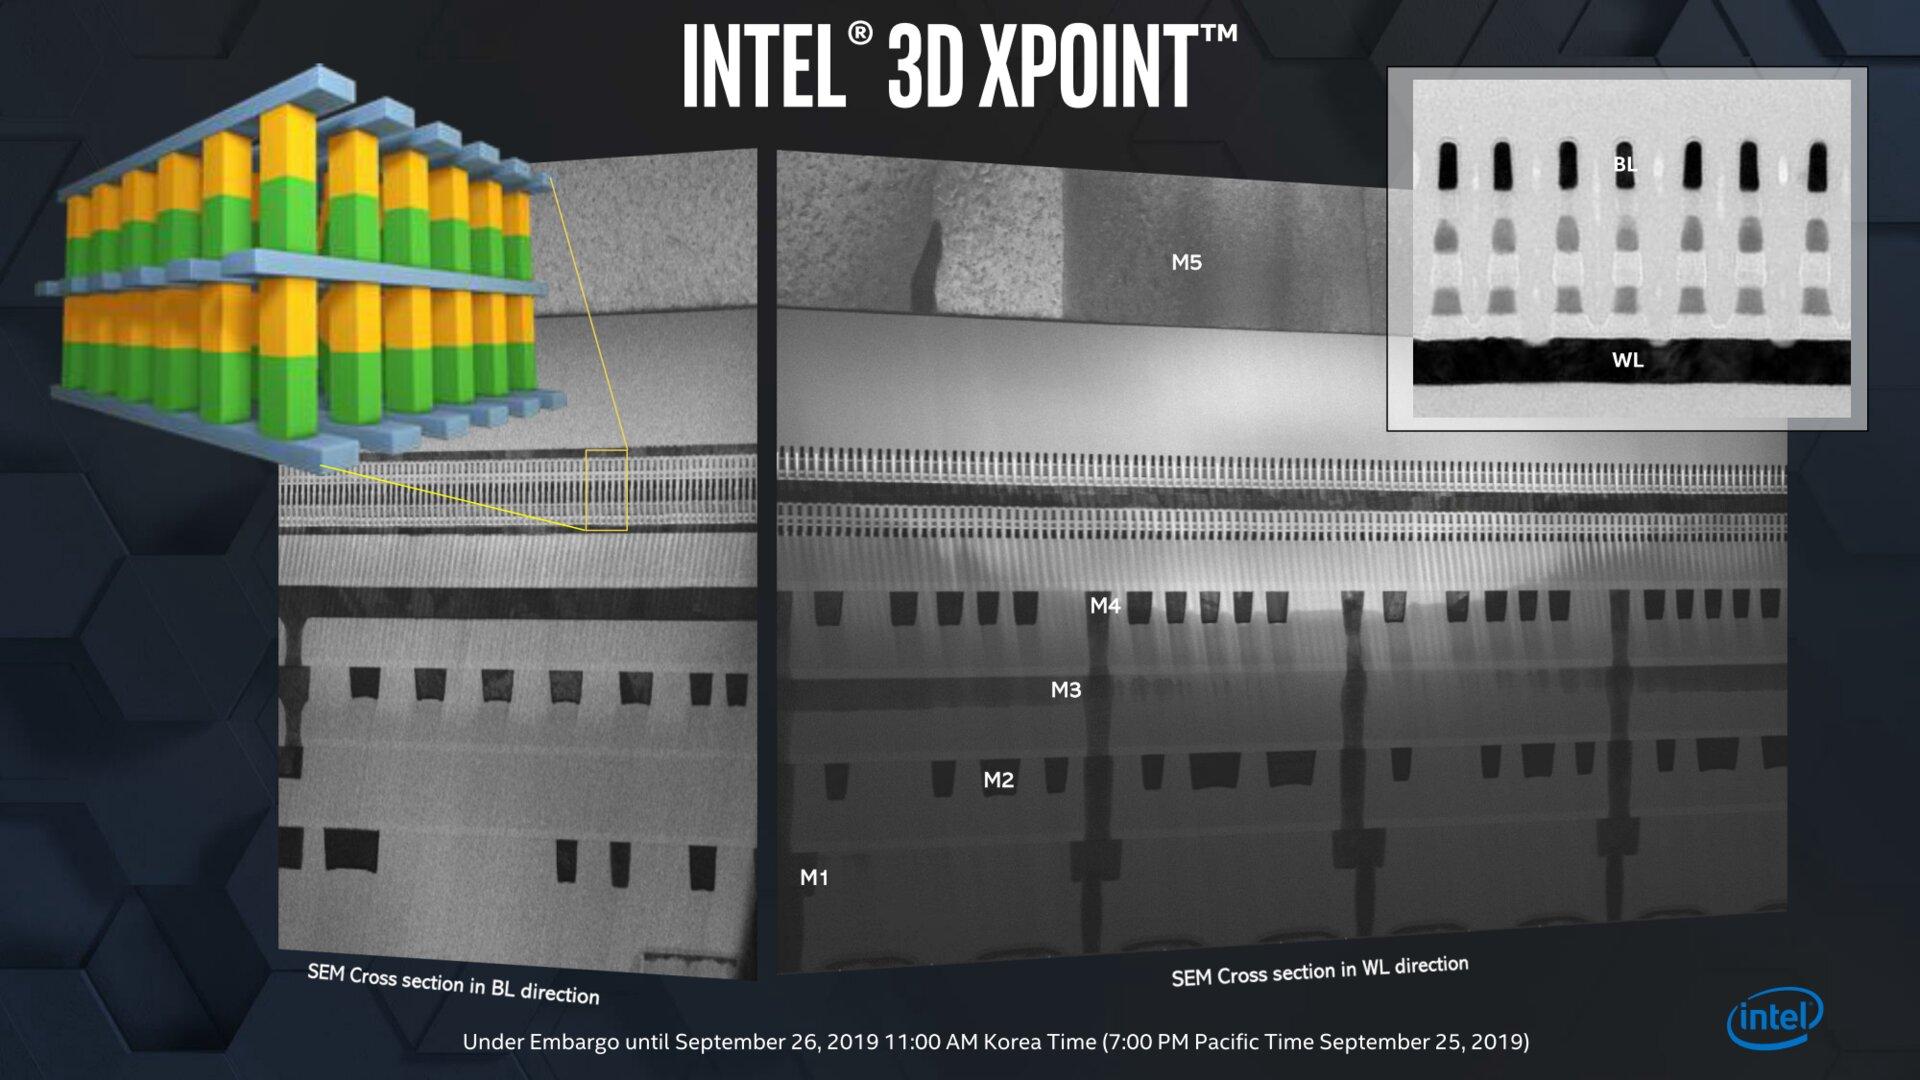 Intels 3D XPoint